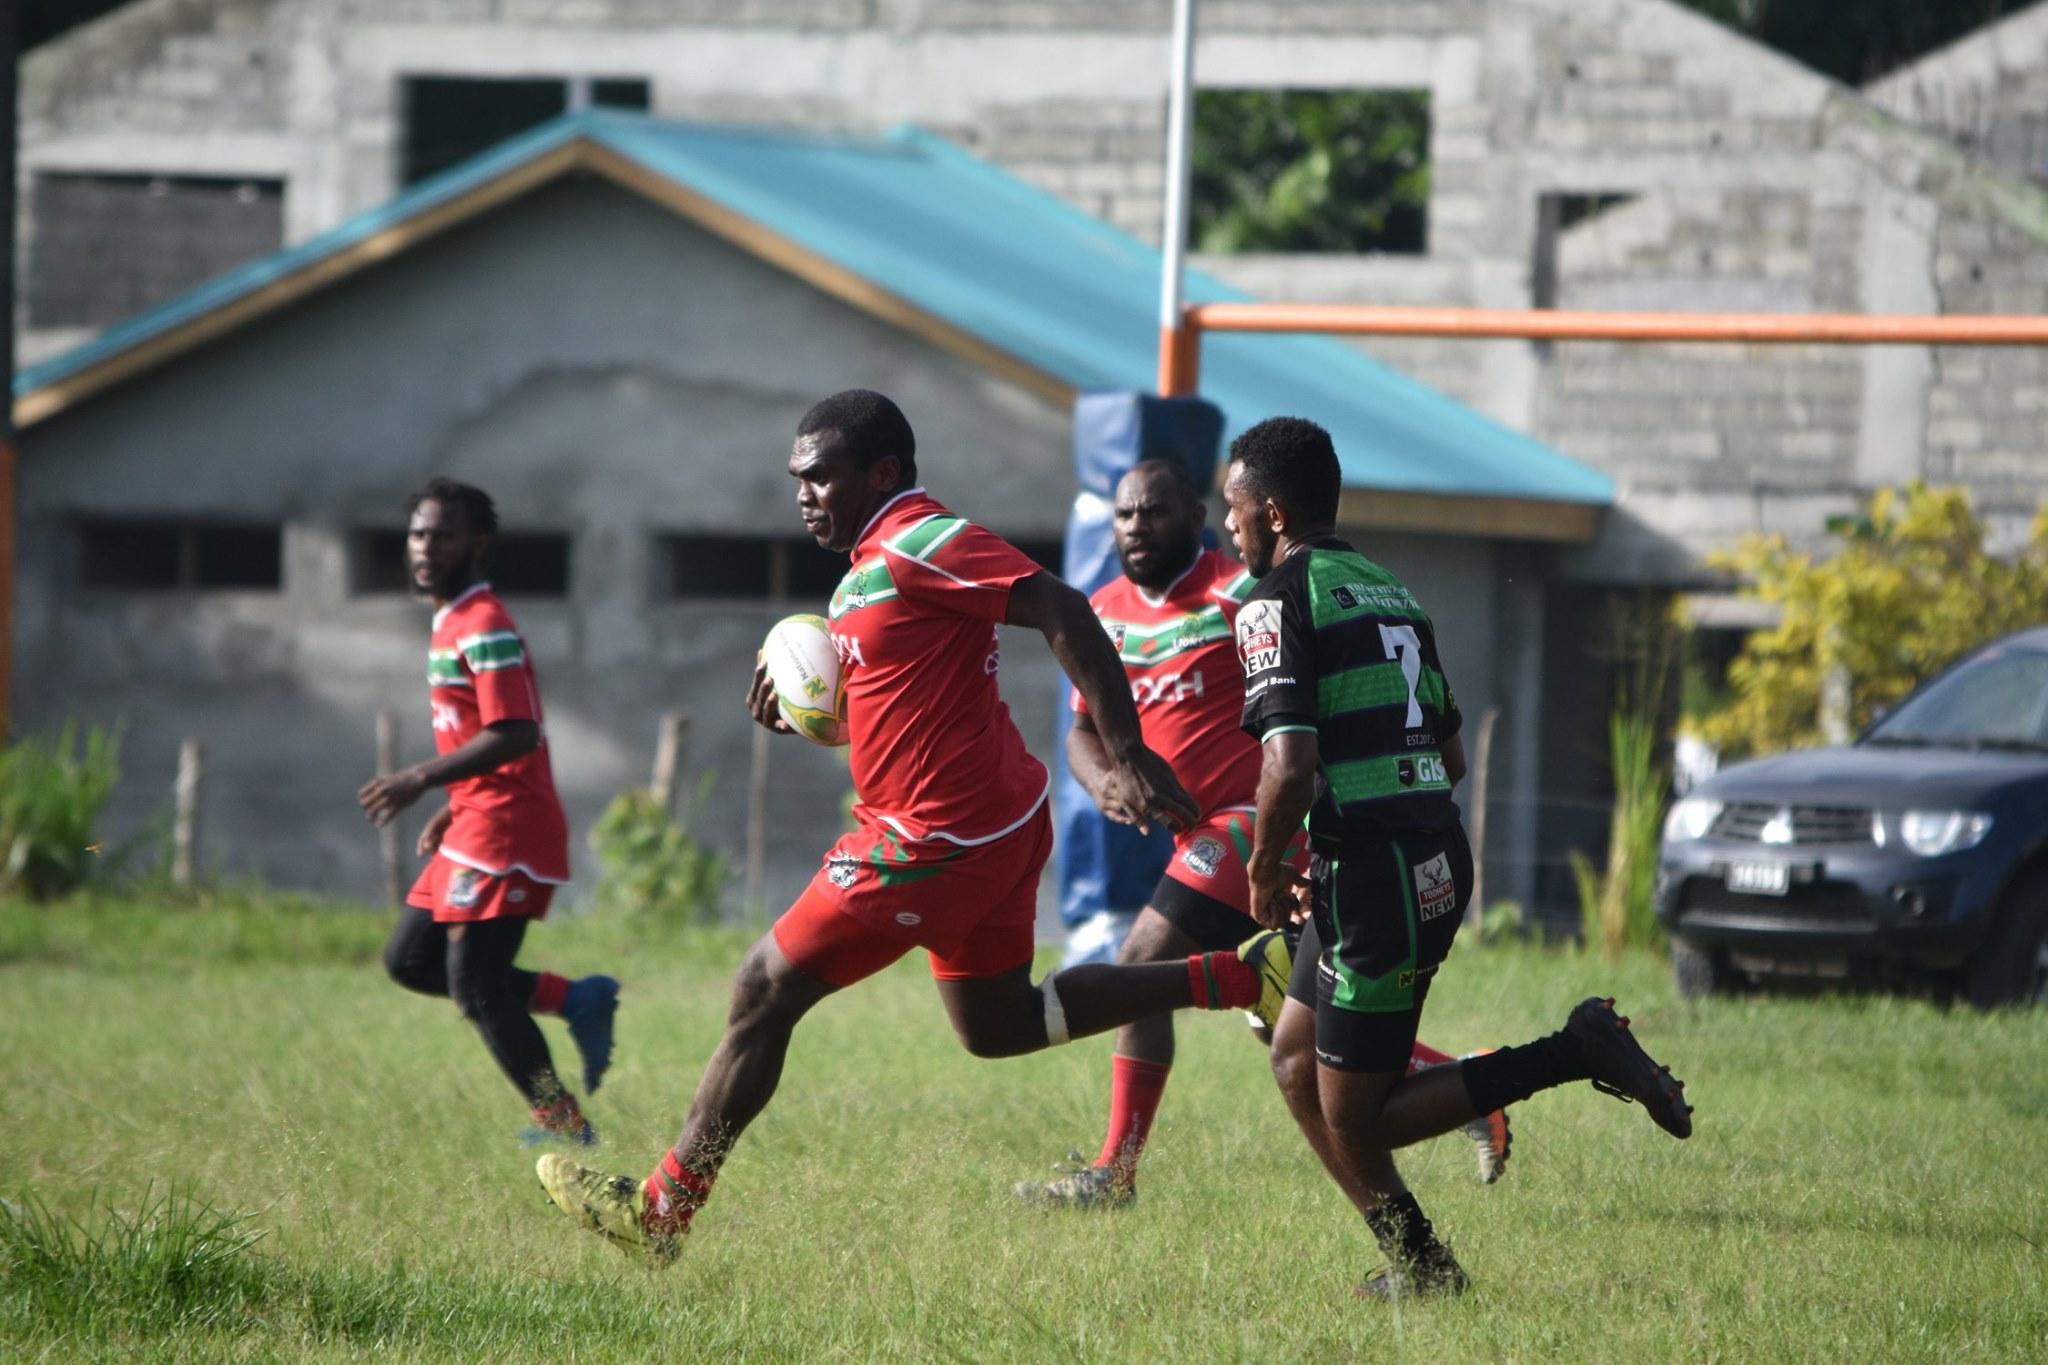 2020 Vanuatu Nines set to take place this weekend